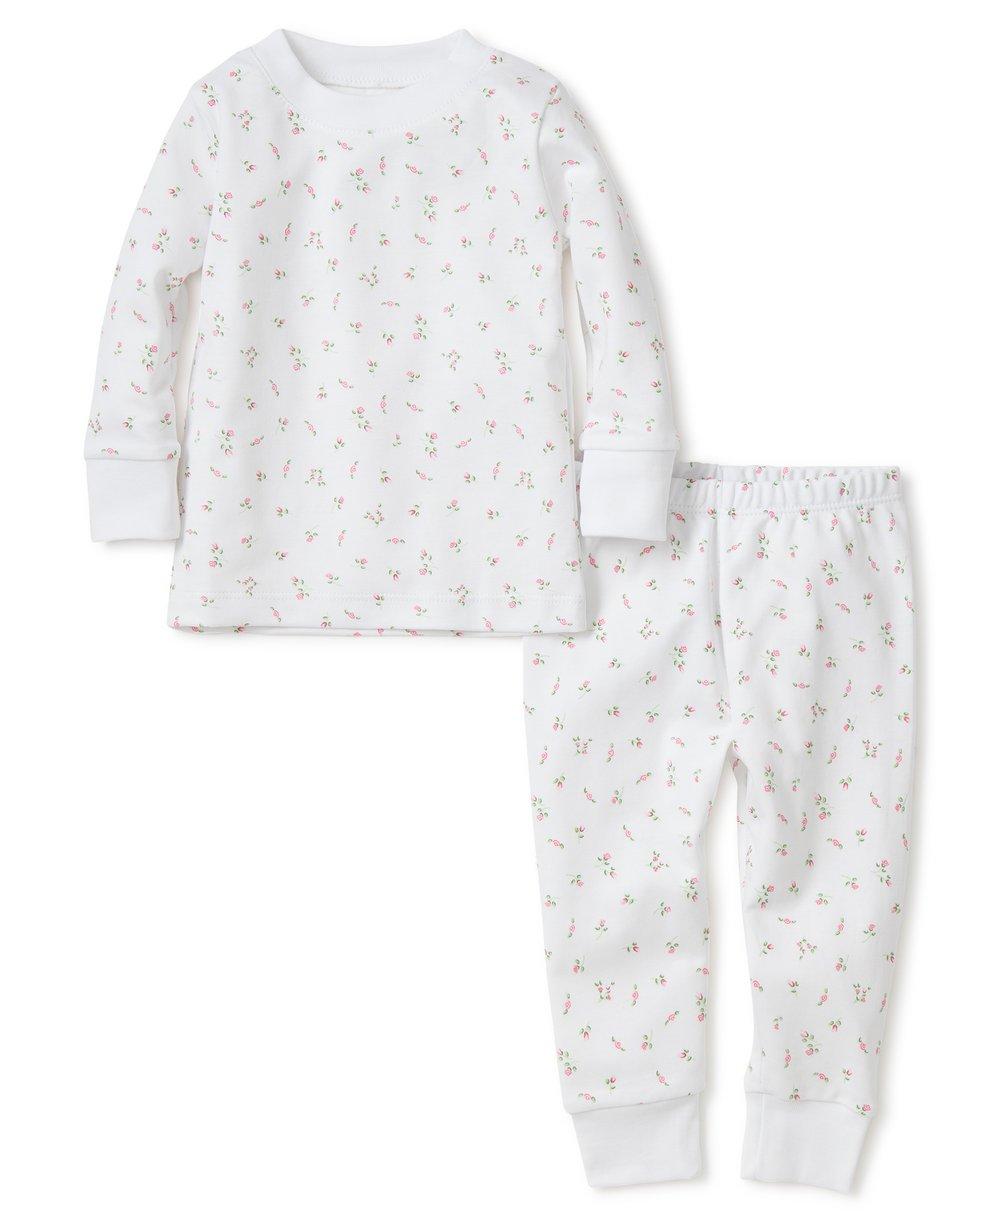 kissy kissy Garden Roses Toddler Pajama Set